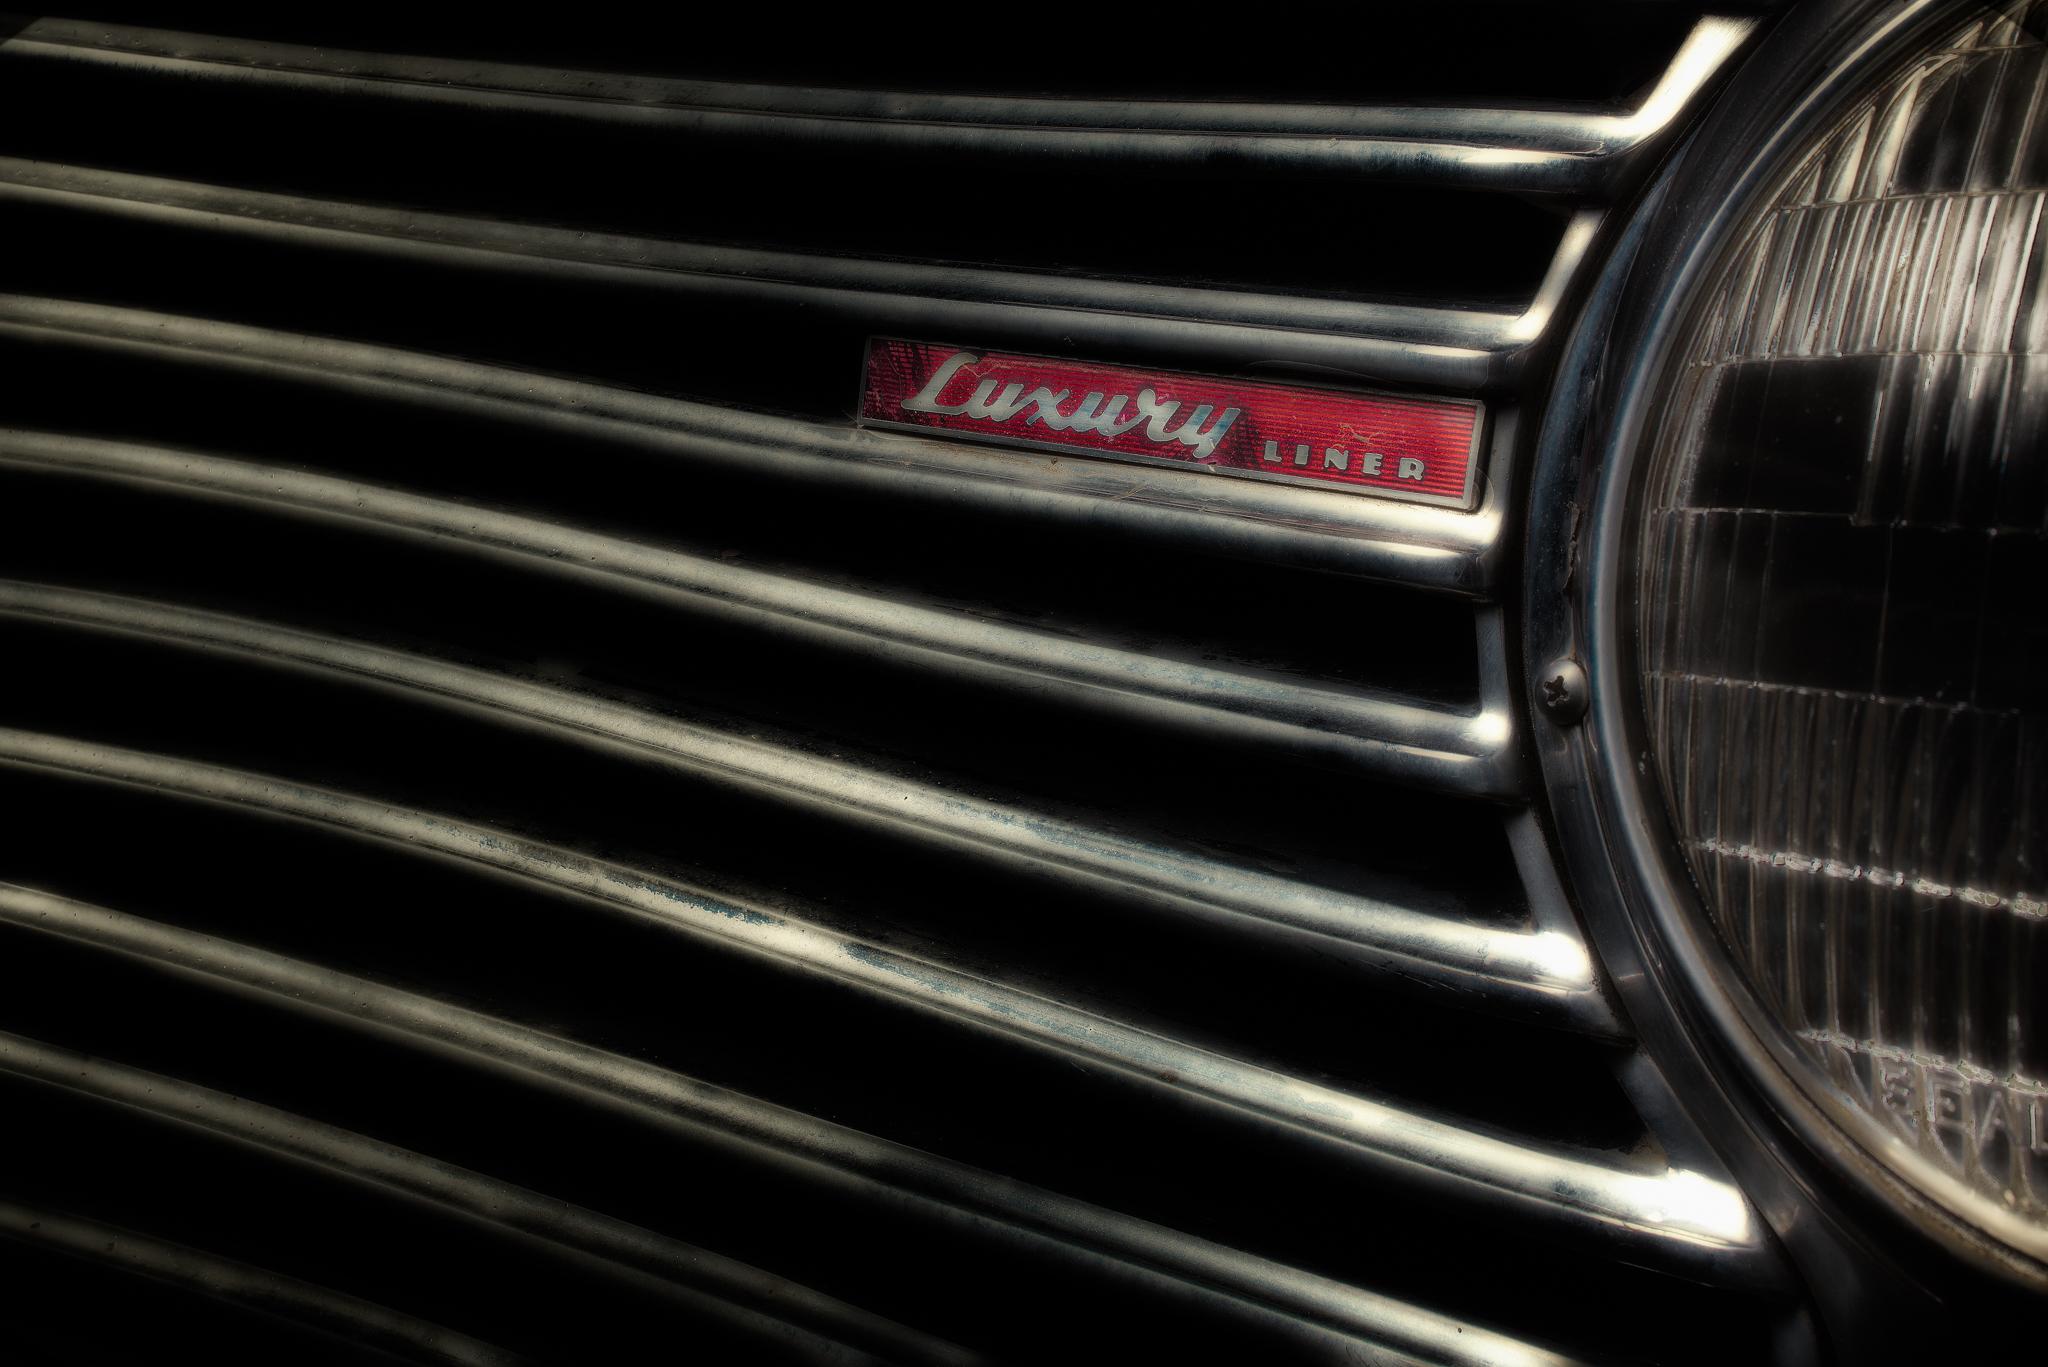 1941 Dodge Luxury Liner #1